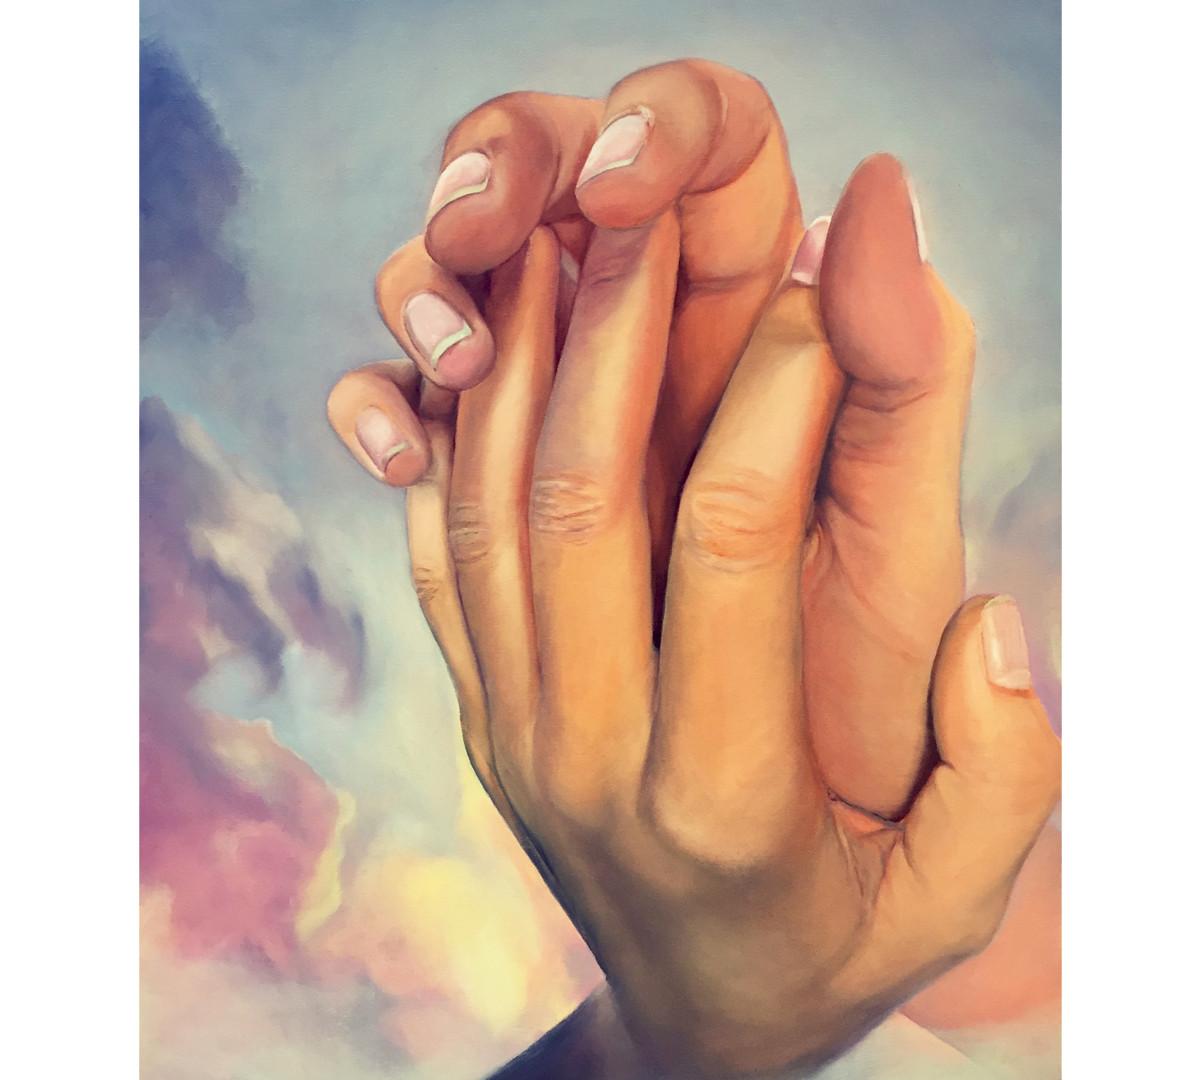 'THE HAND OF GODDESS', 2017